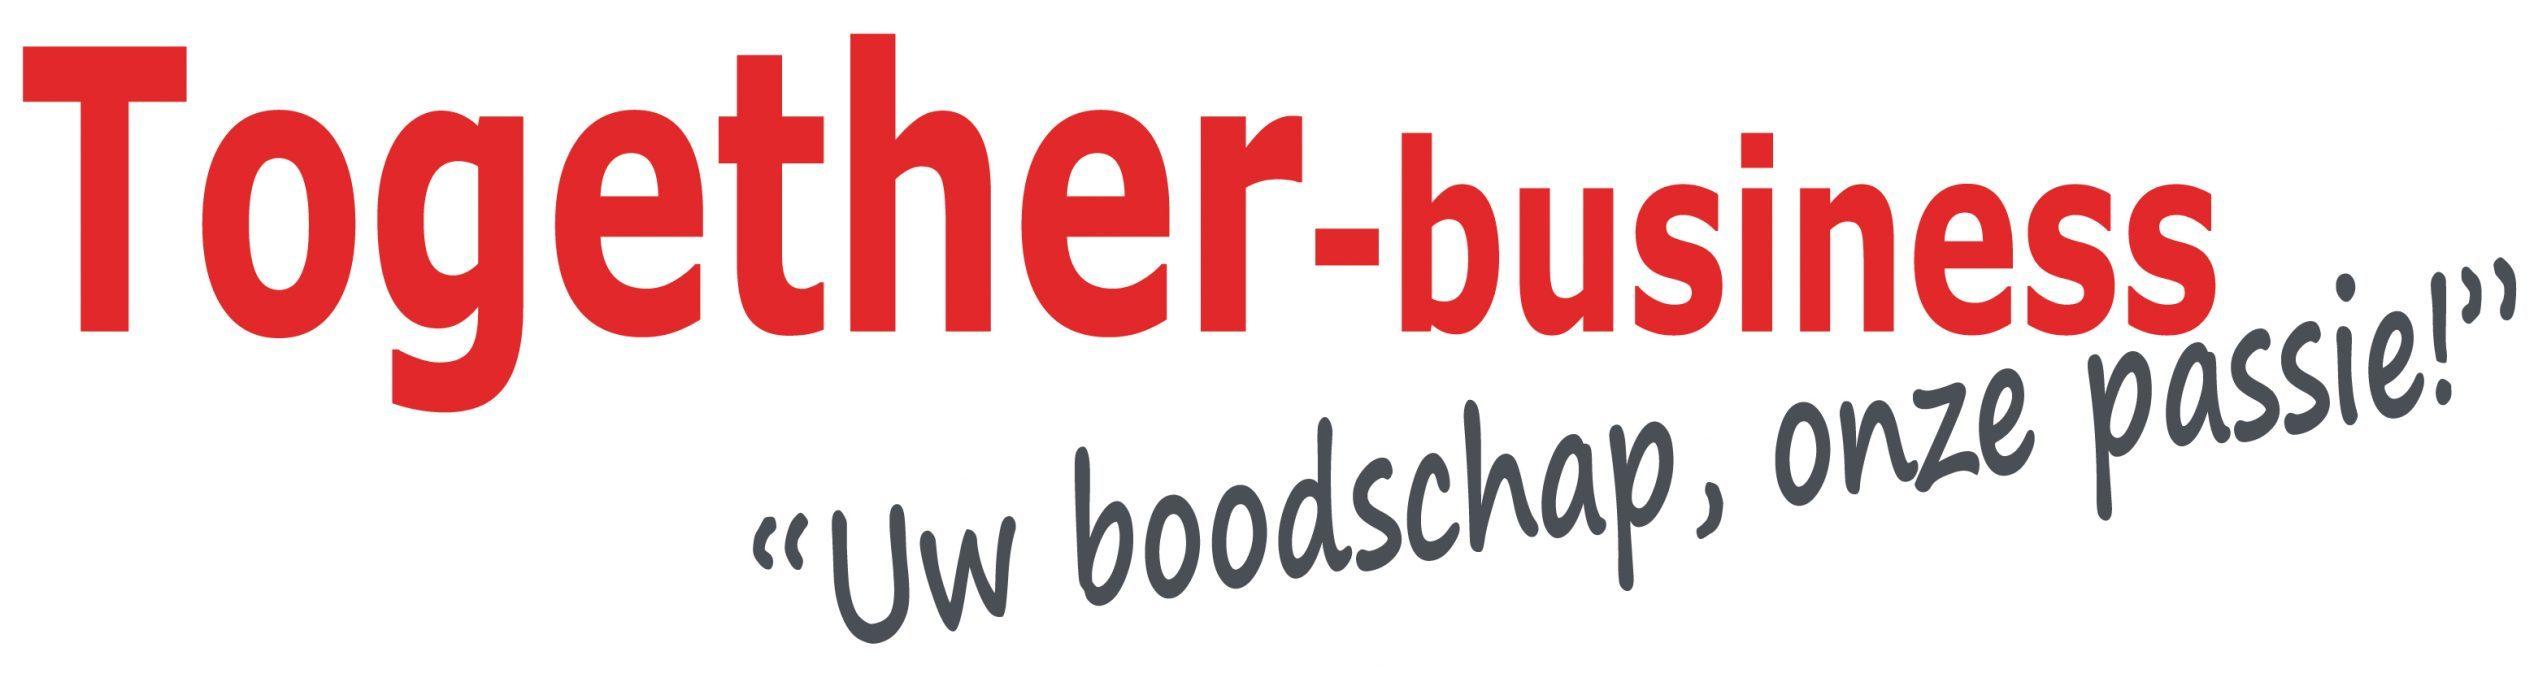 Together-business